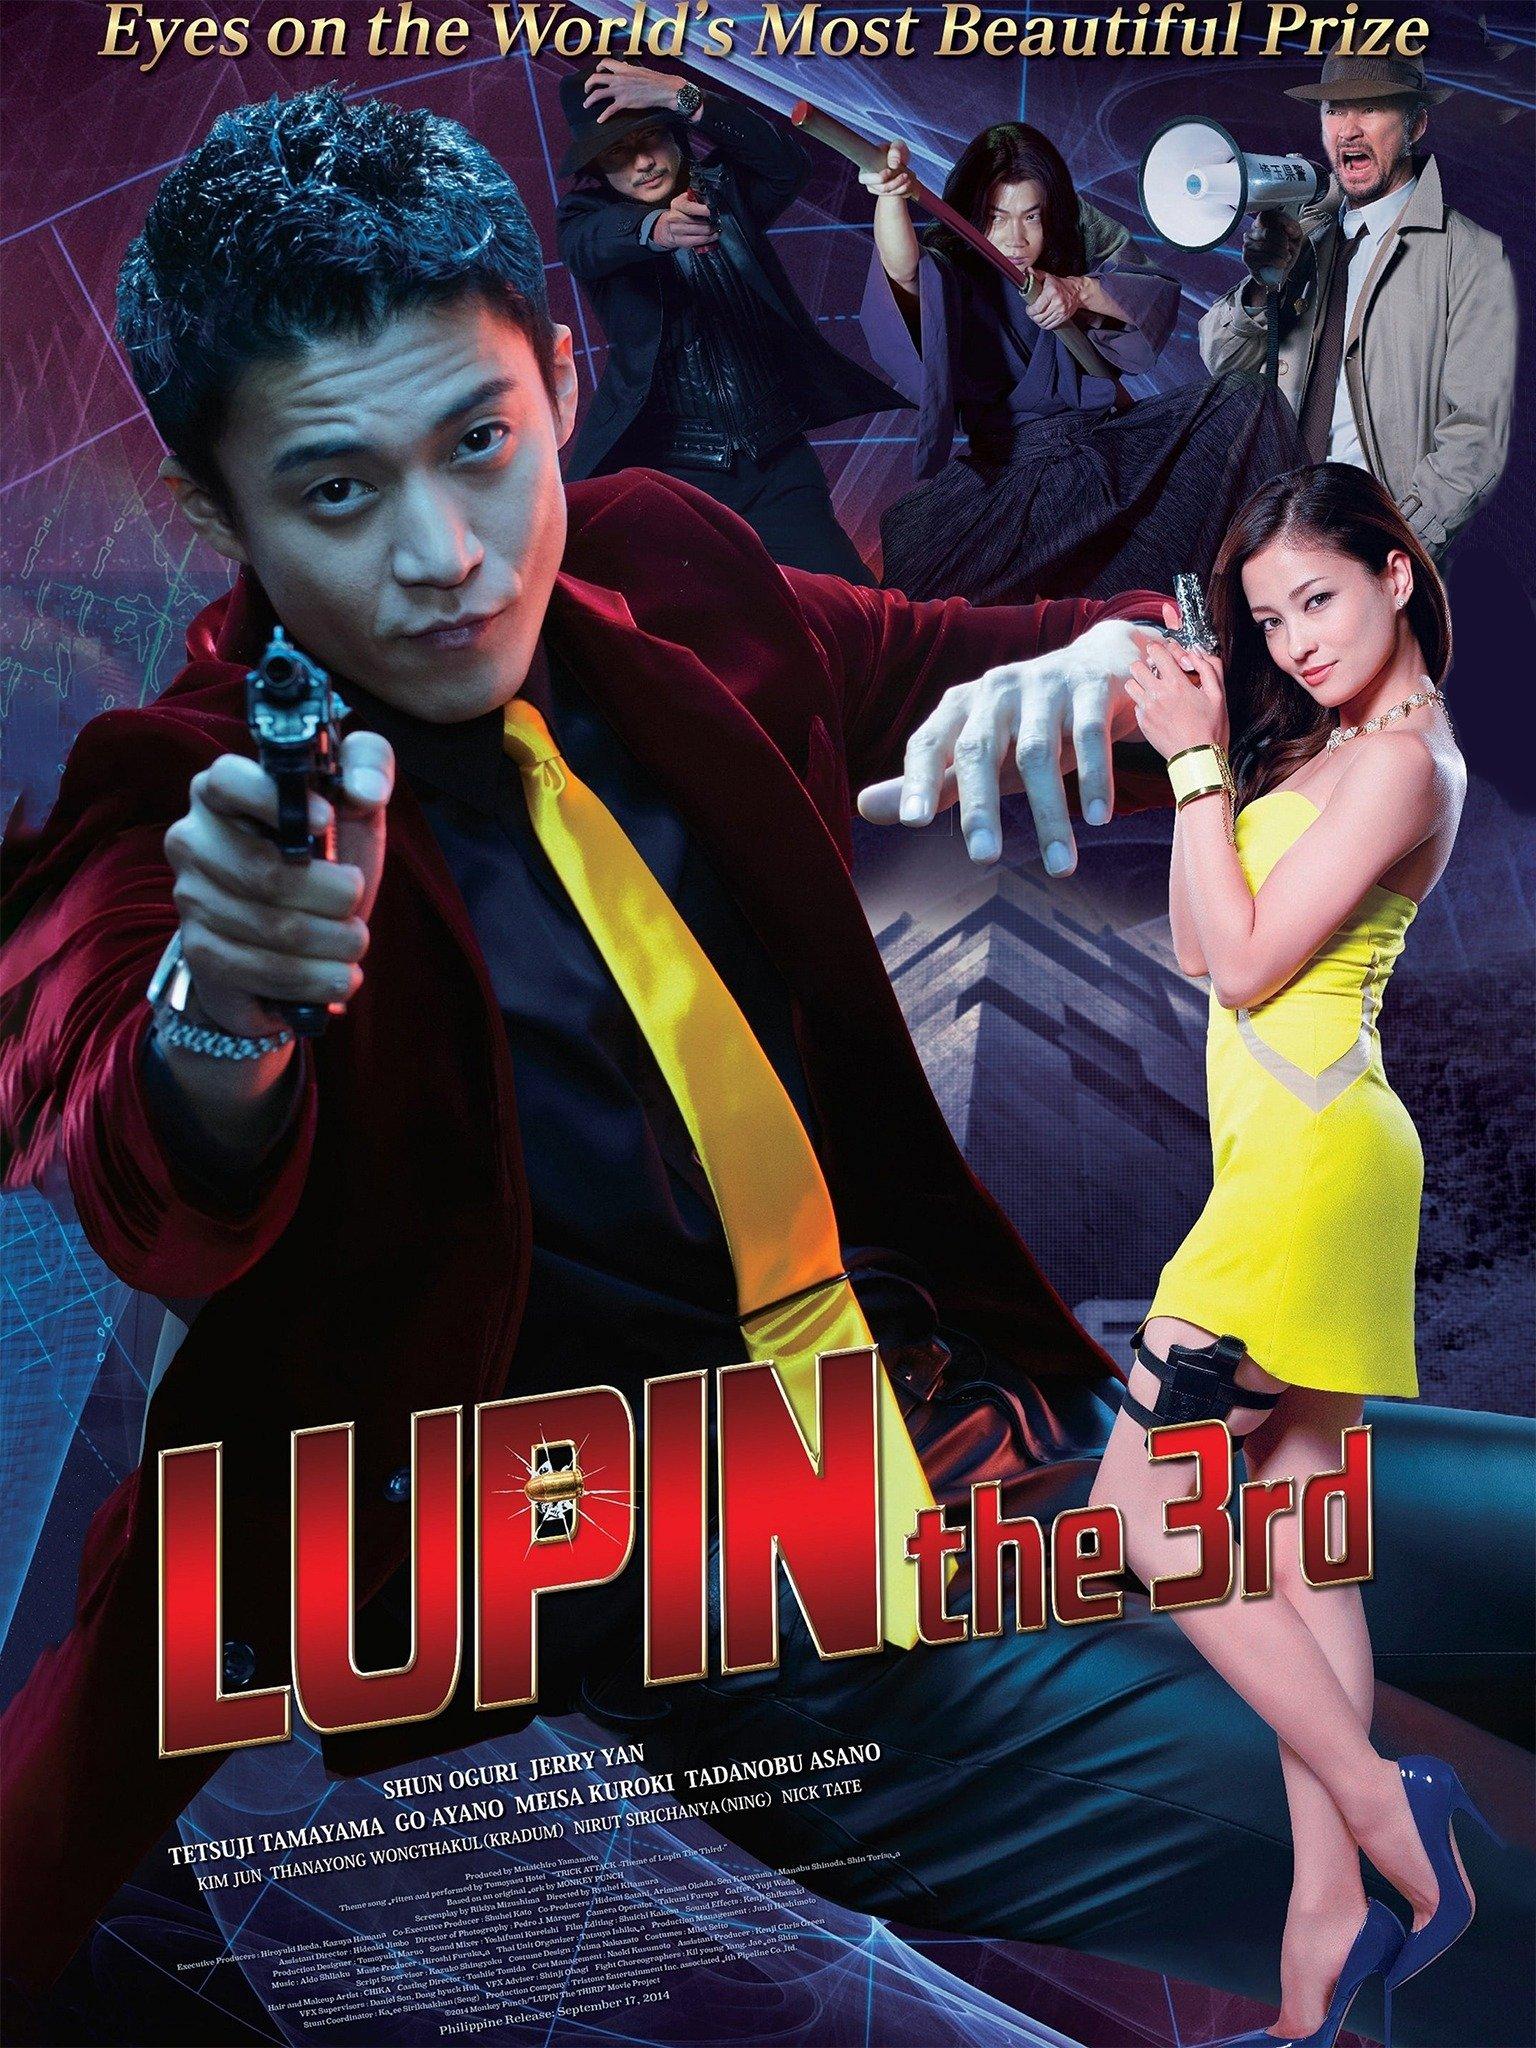 Lupin The Third -film -VOSTFR-WEBDL1080p-[Kehai-Fansub]